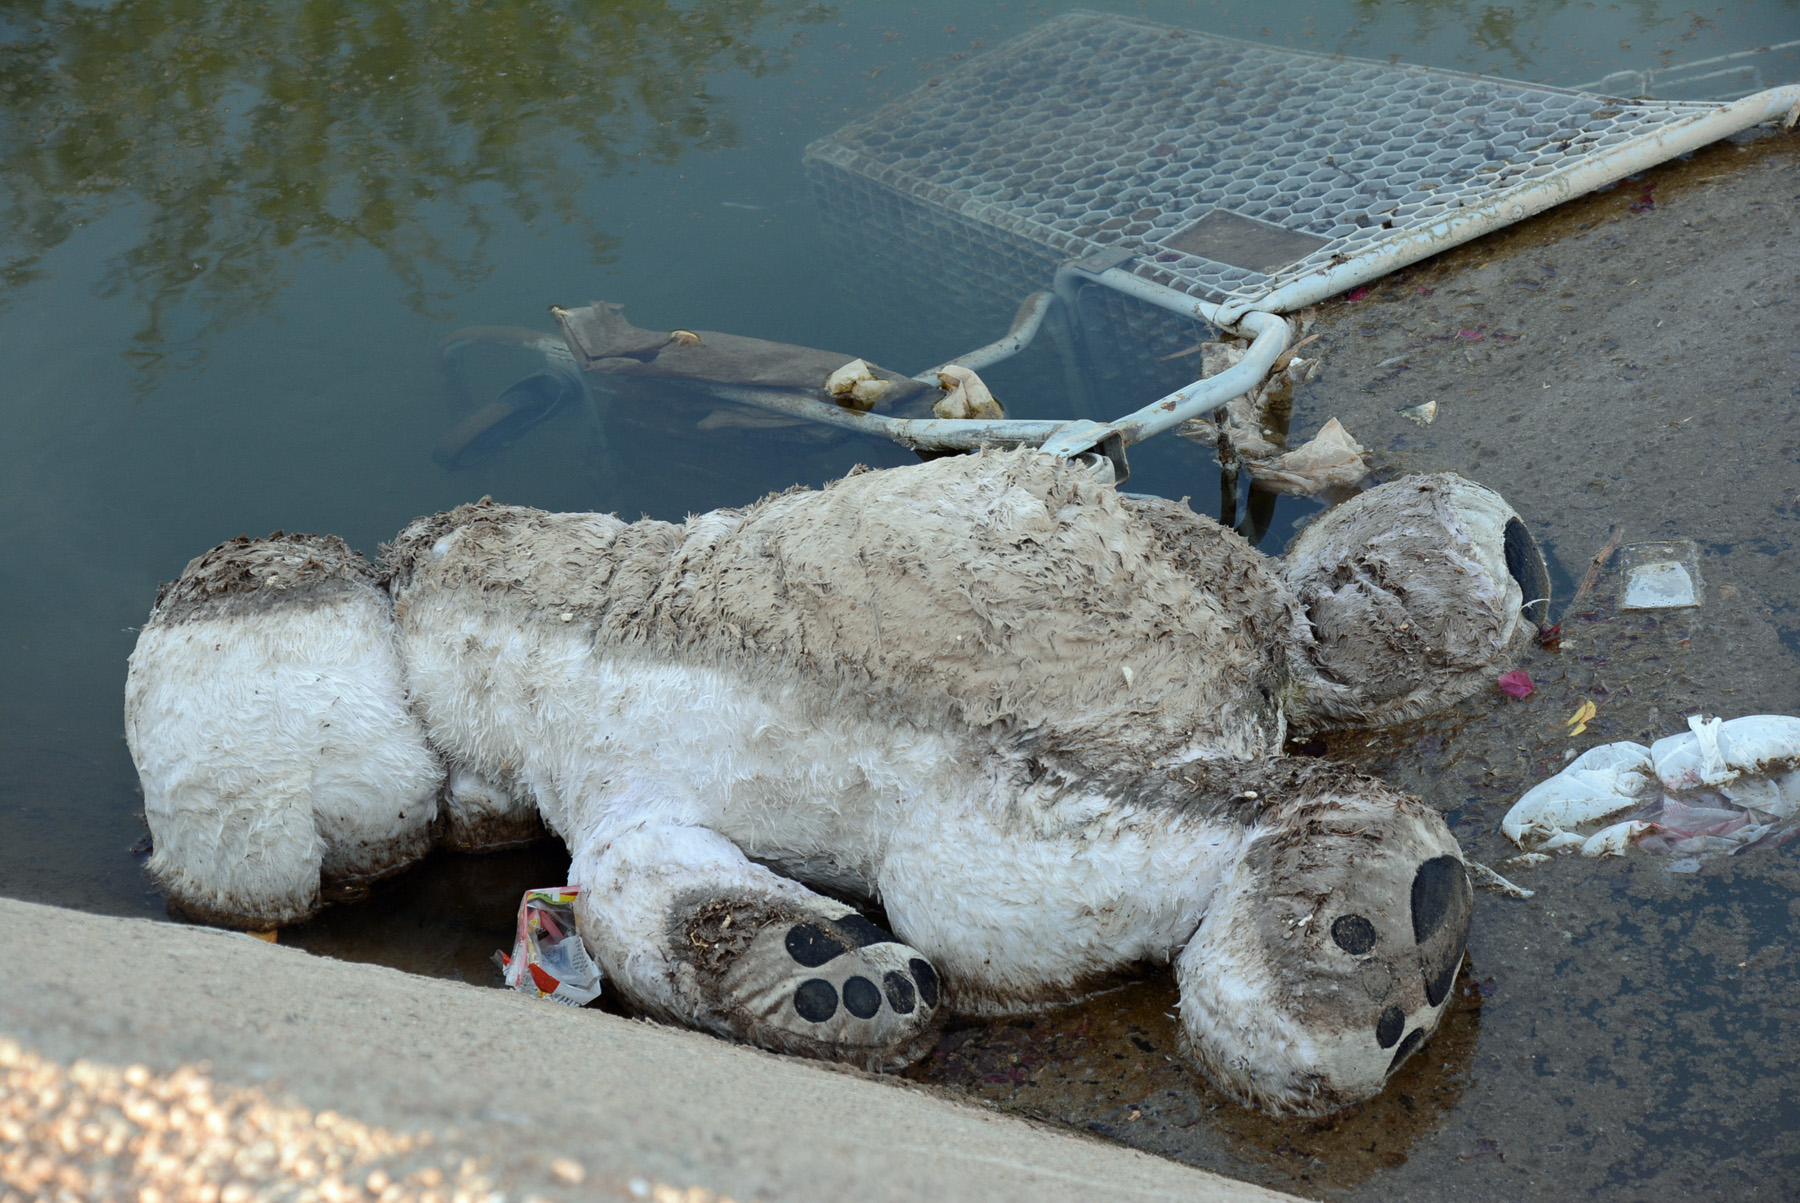 Stuffed in Canal